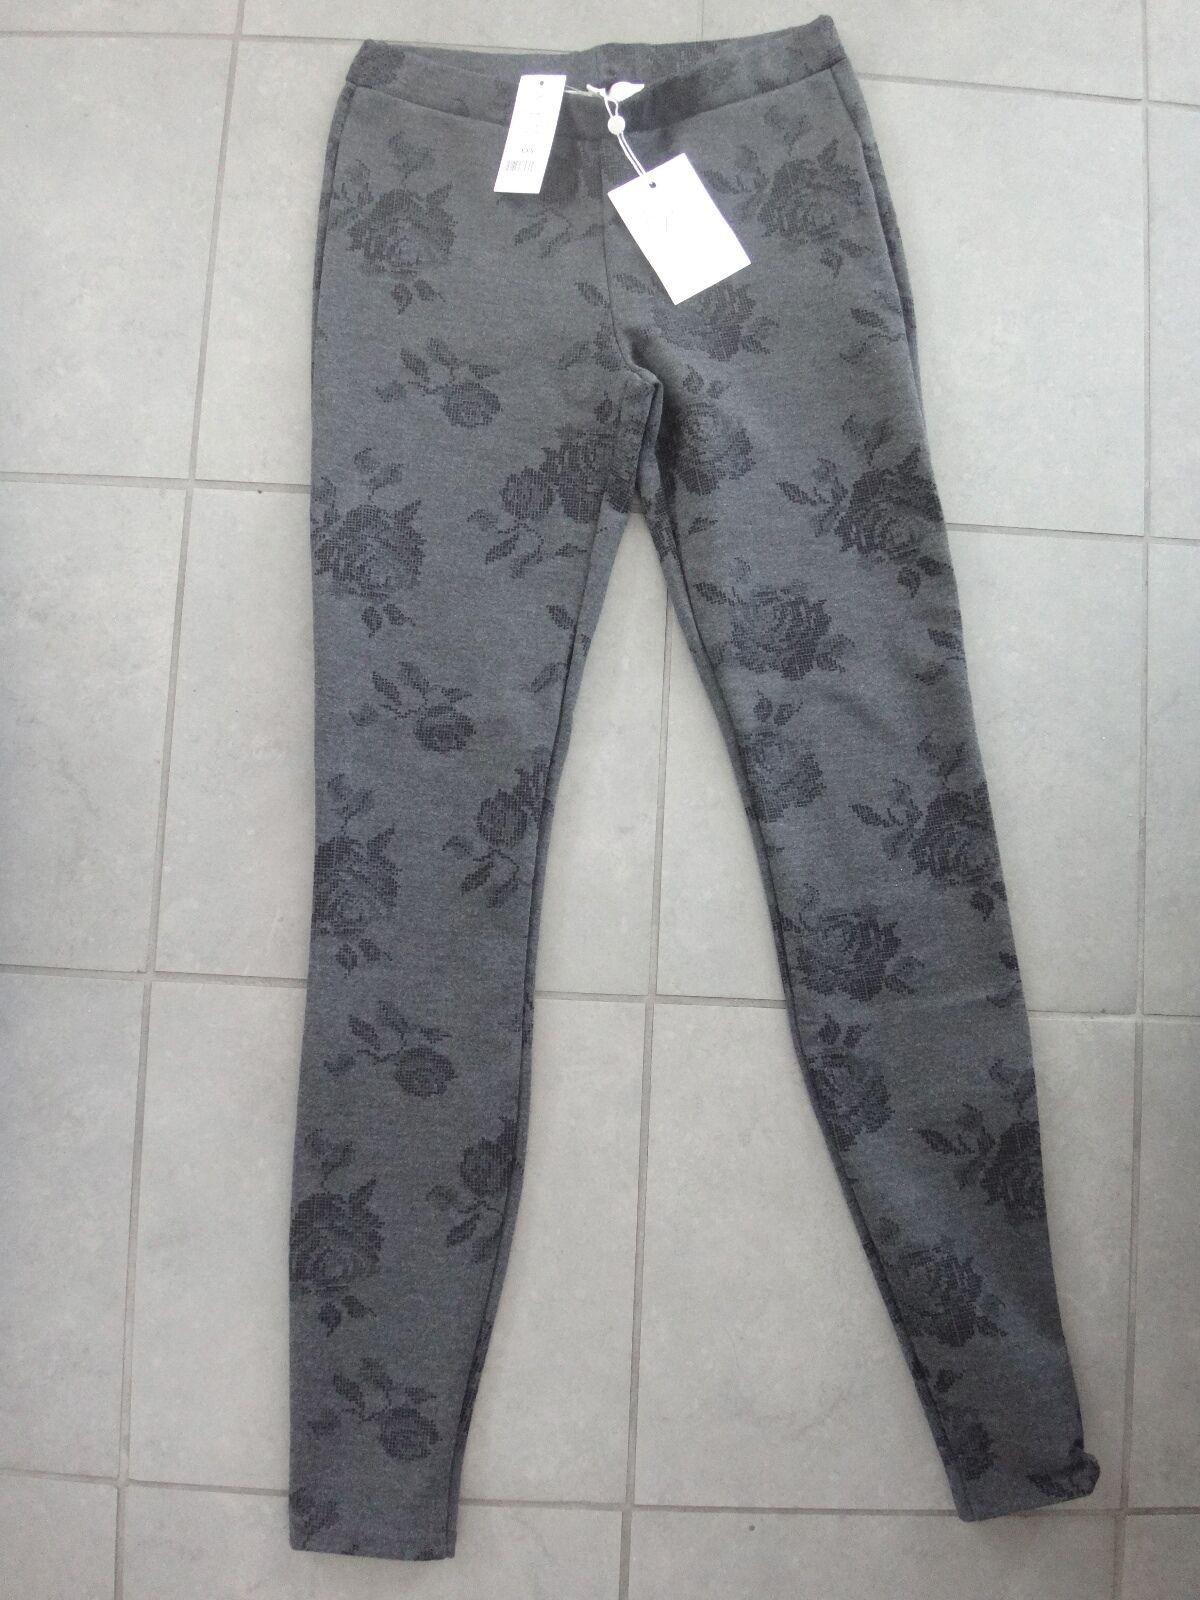 Joie Leggings Keena Printed Floral Ponte pants in charcoal heater XXS NWT